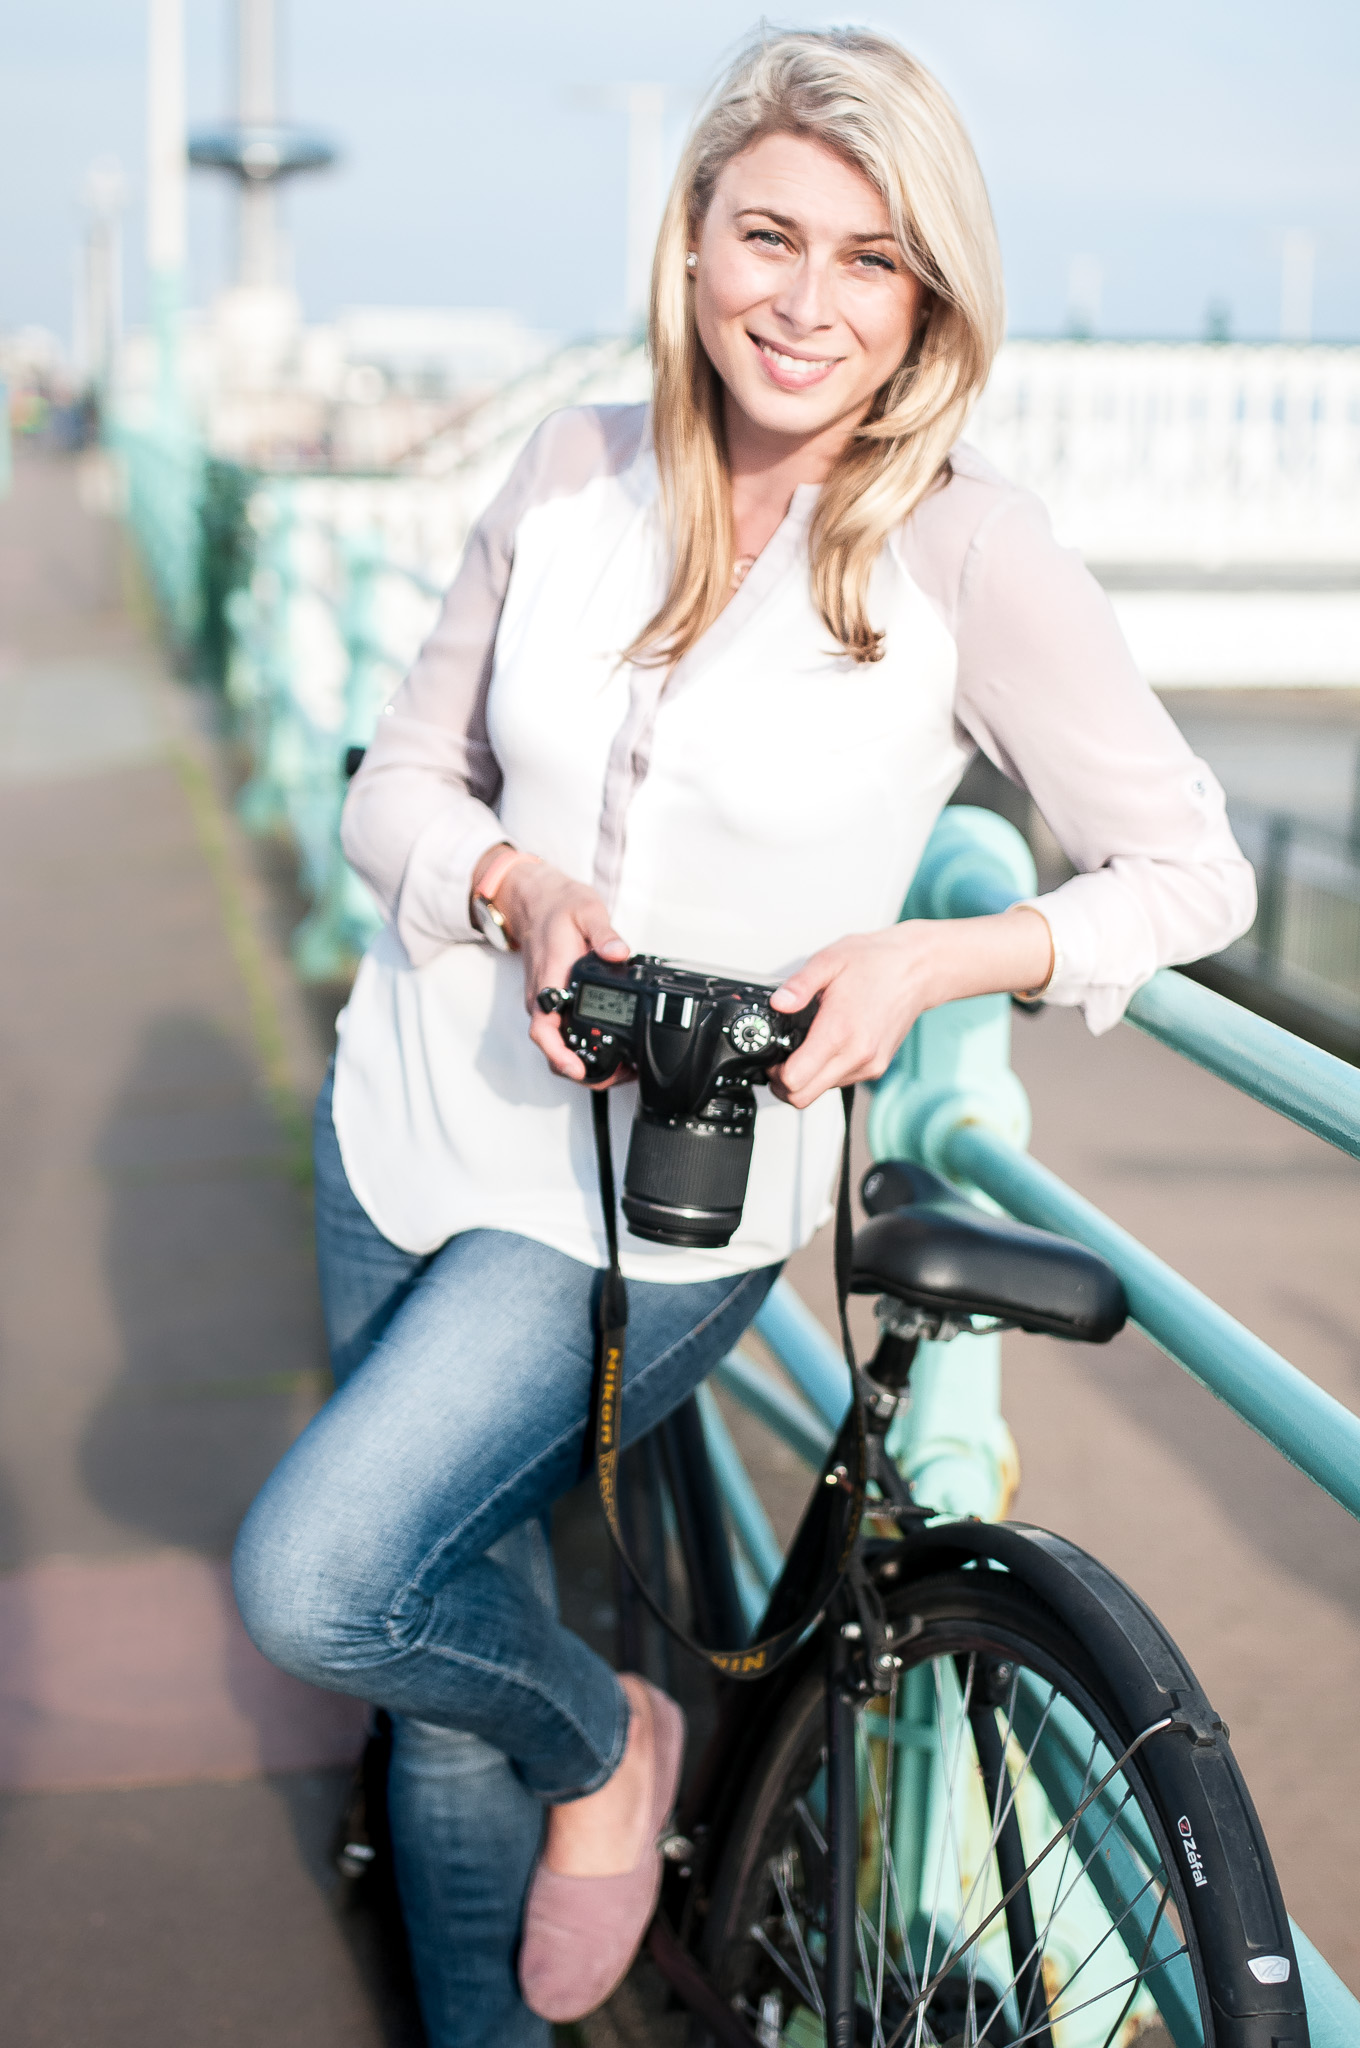 Magdalena Smolarska Headshot Photographer from Brighton and London